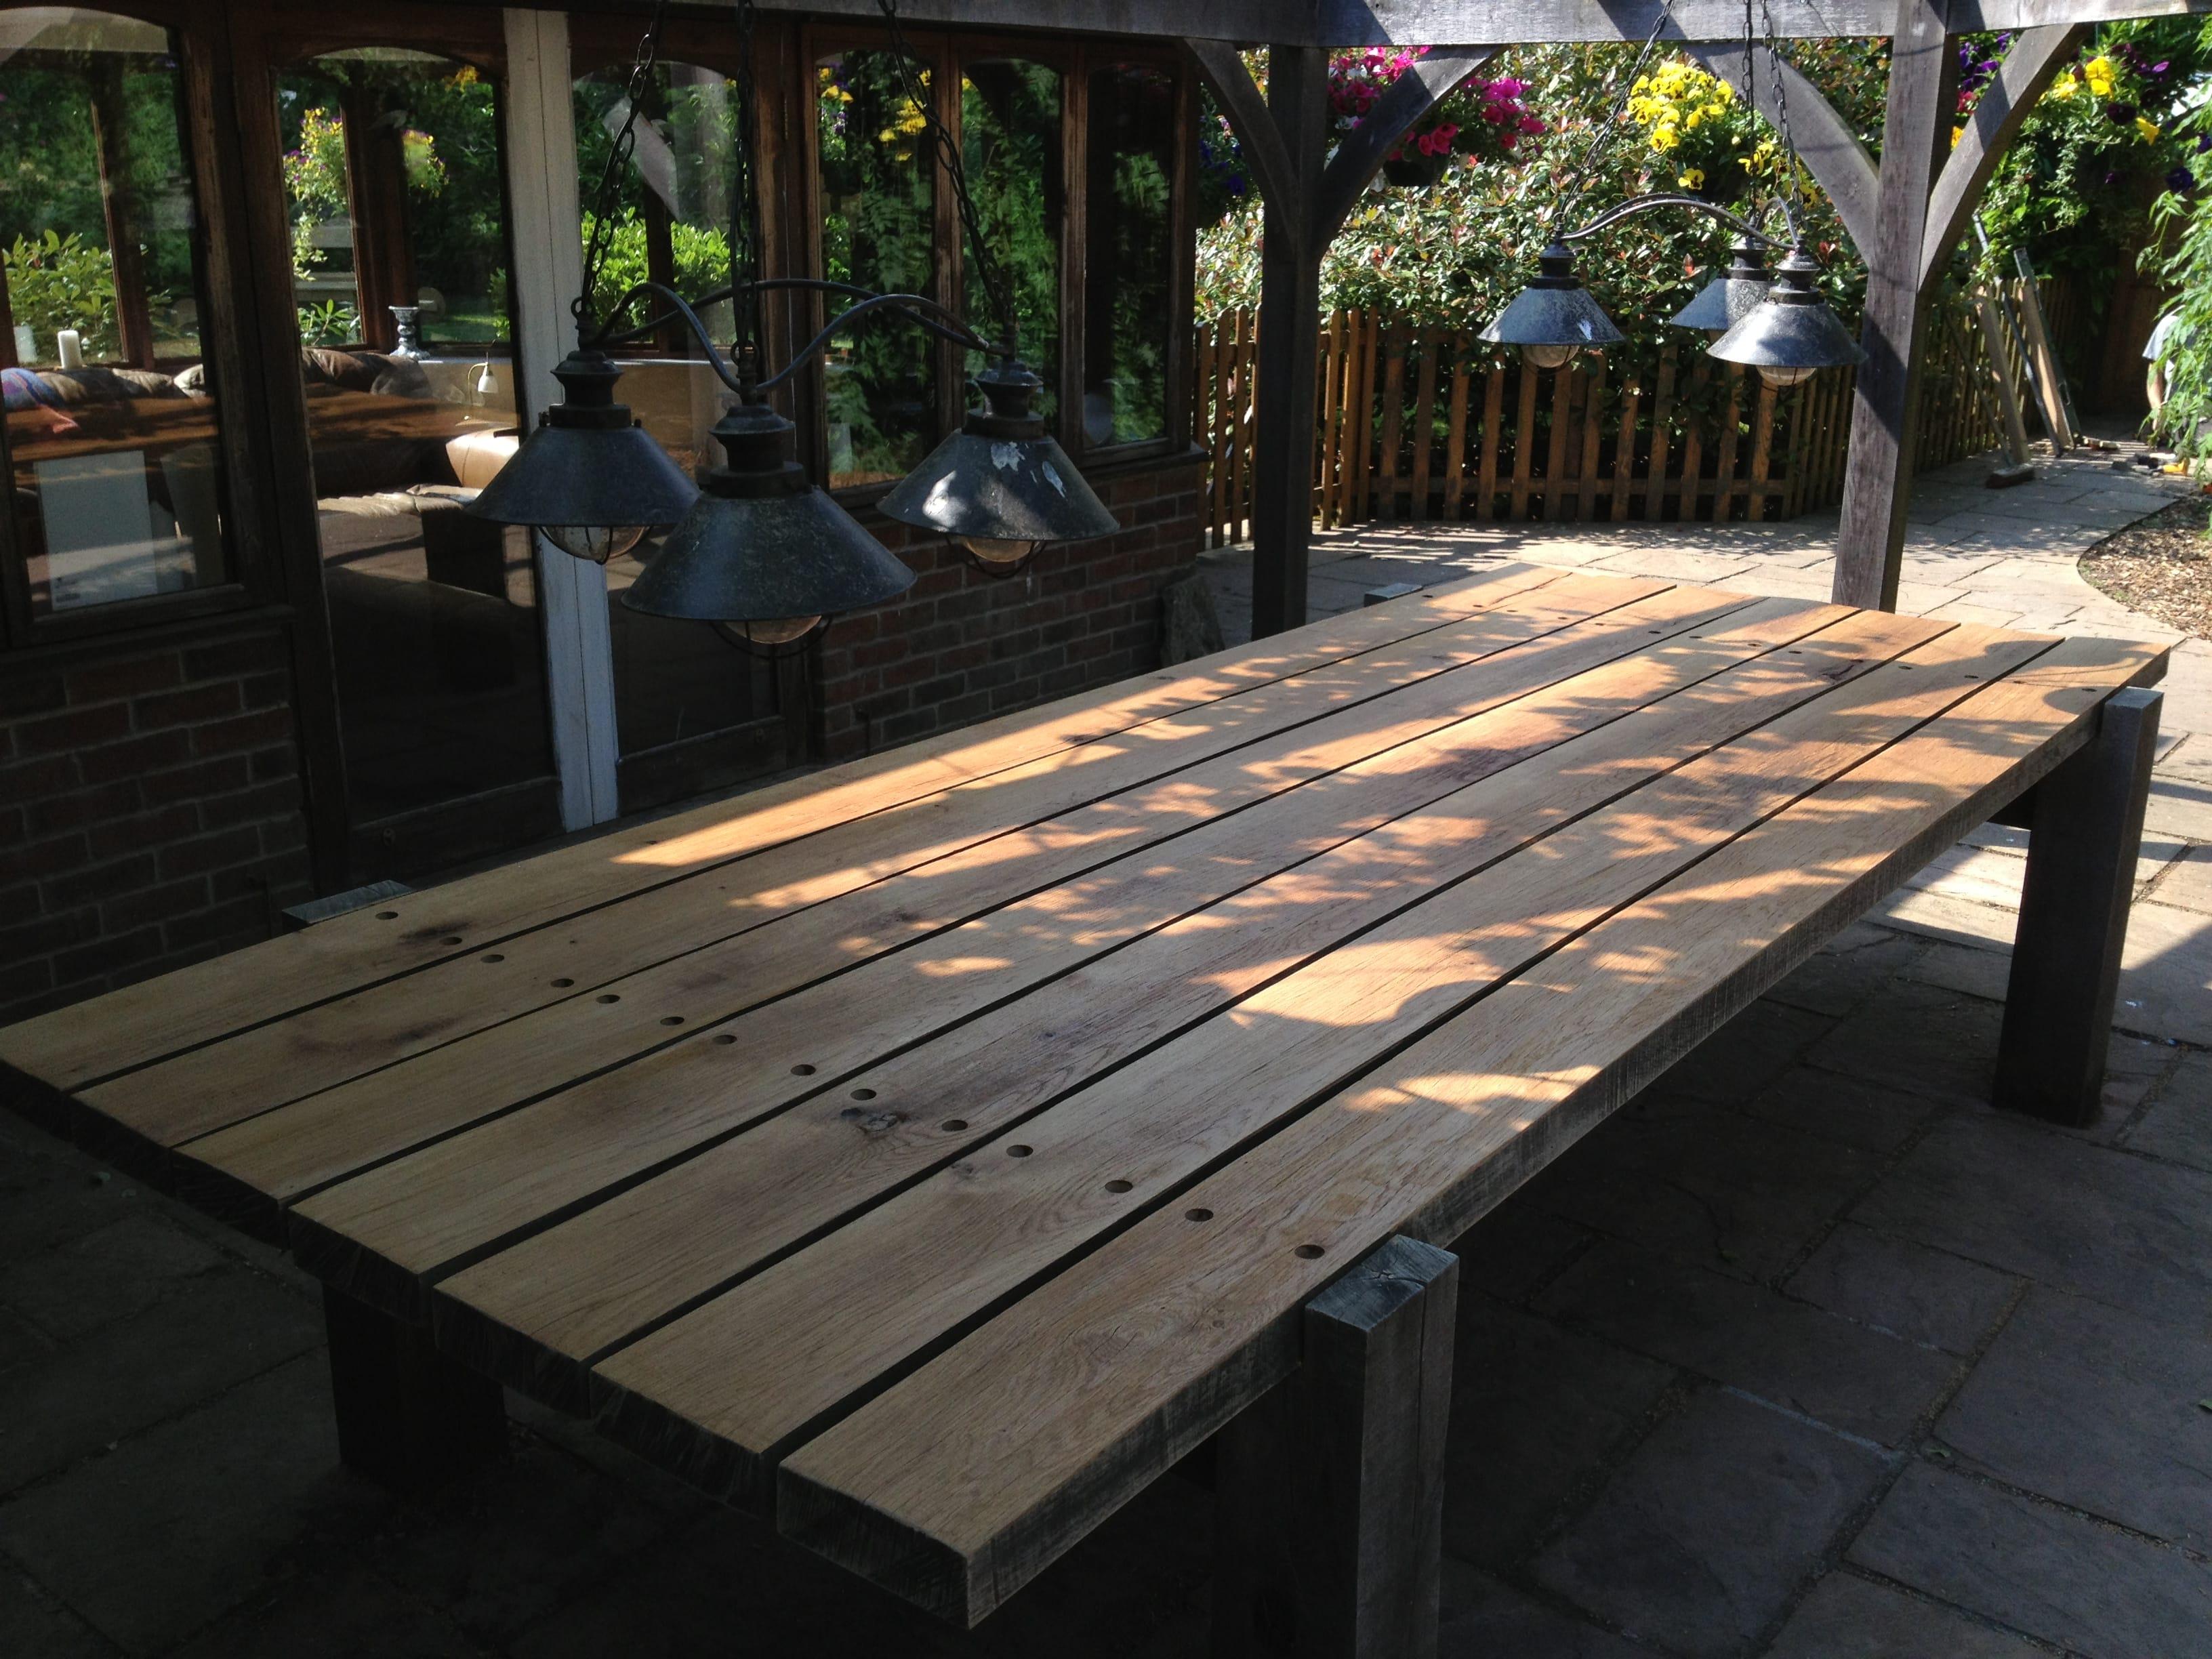 Magnificent Jla Joinery Bespoke Garden Furniture Beatyapartments Chair Design Images Beatyapartmentscom